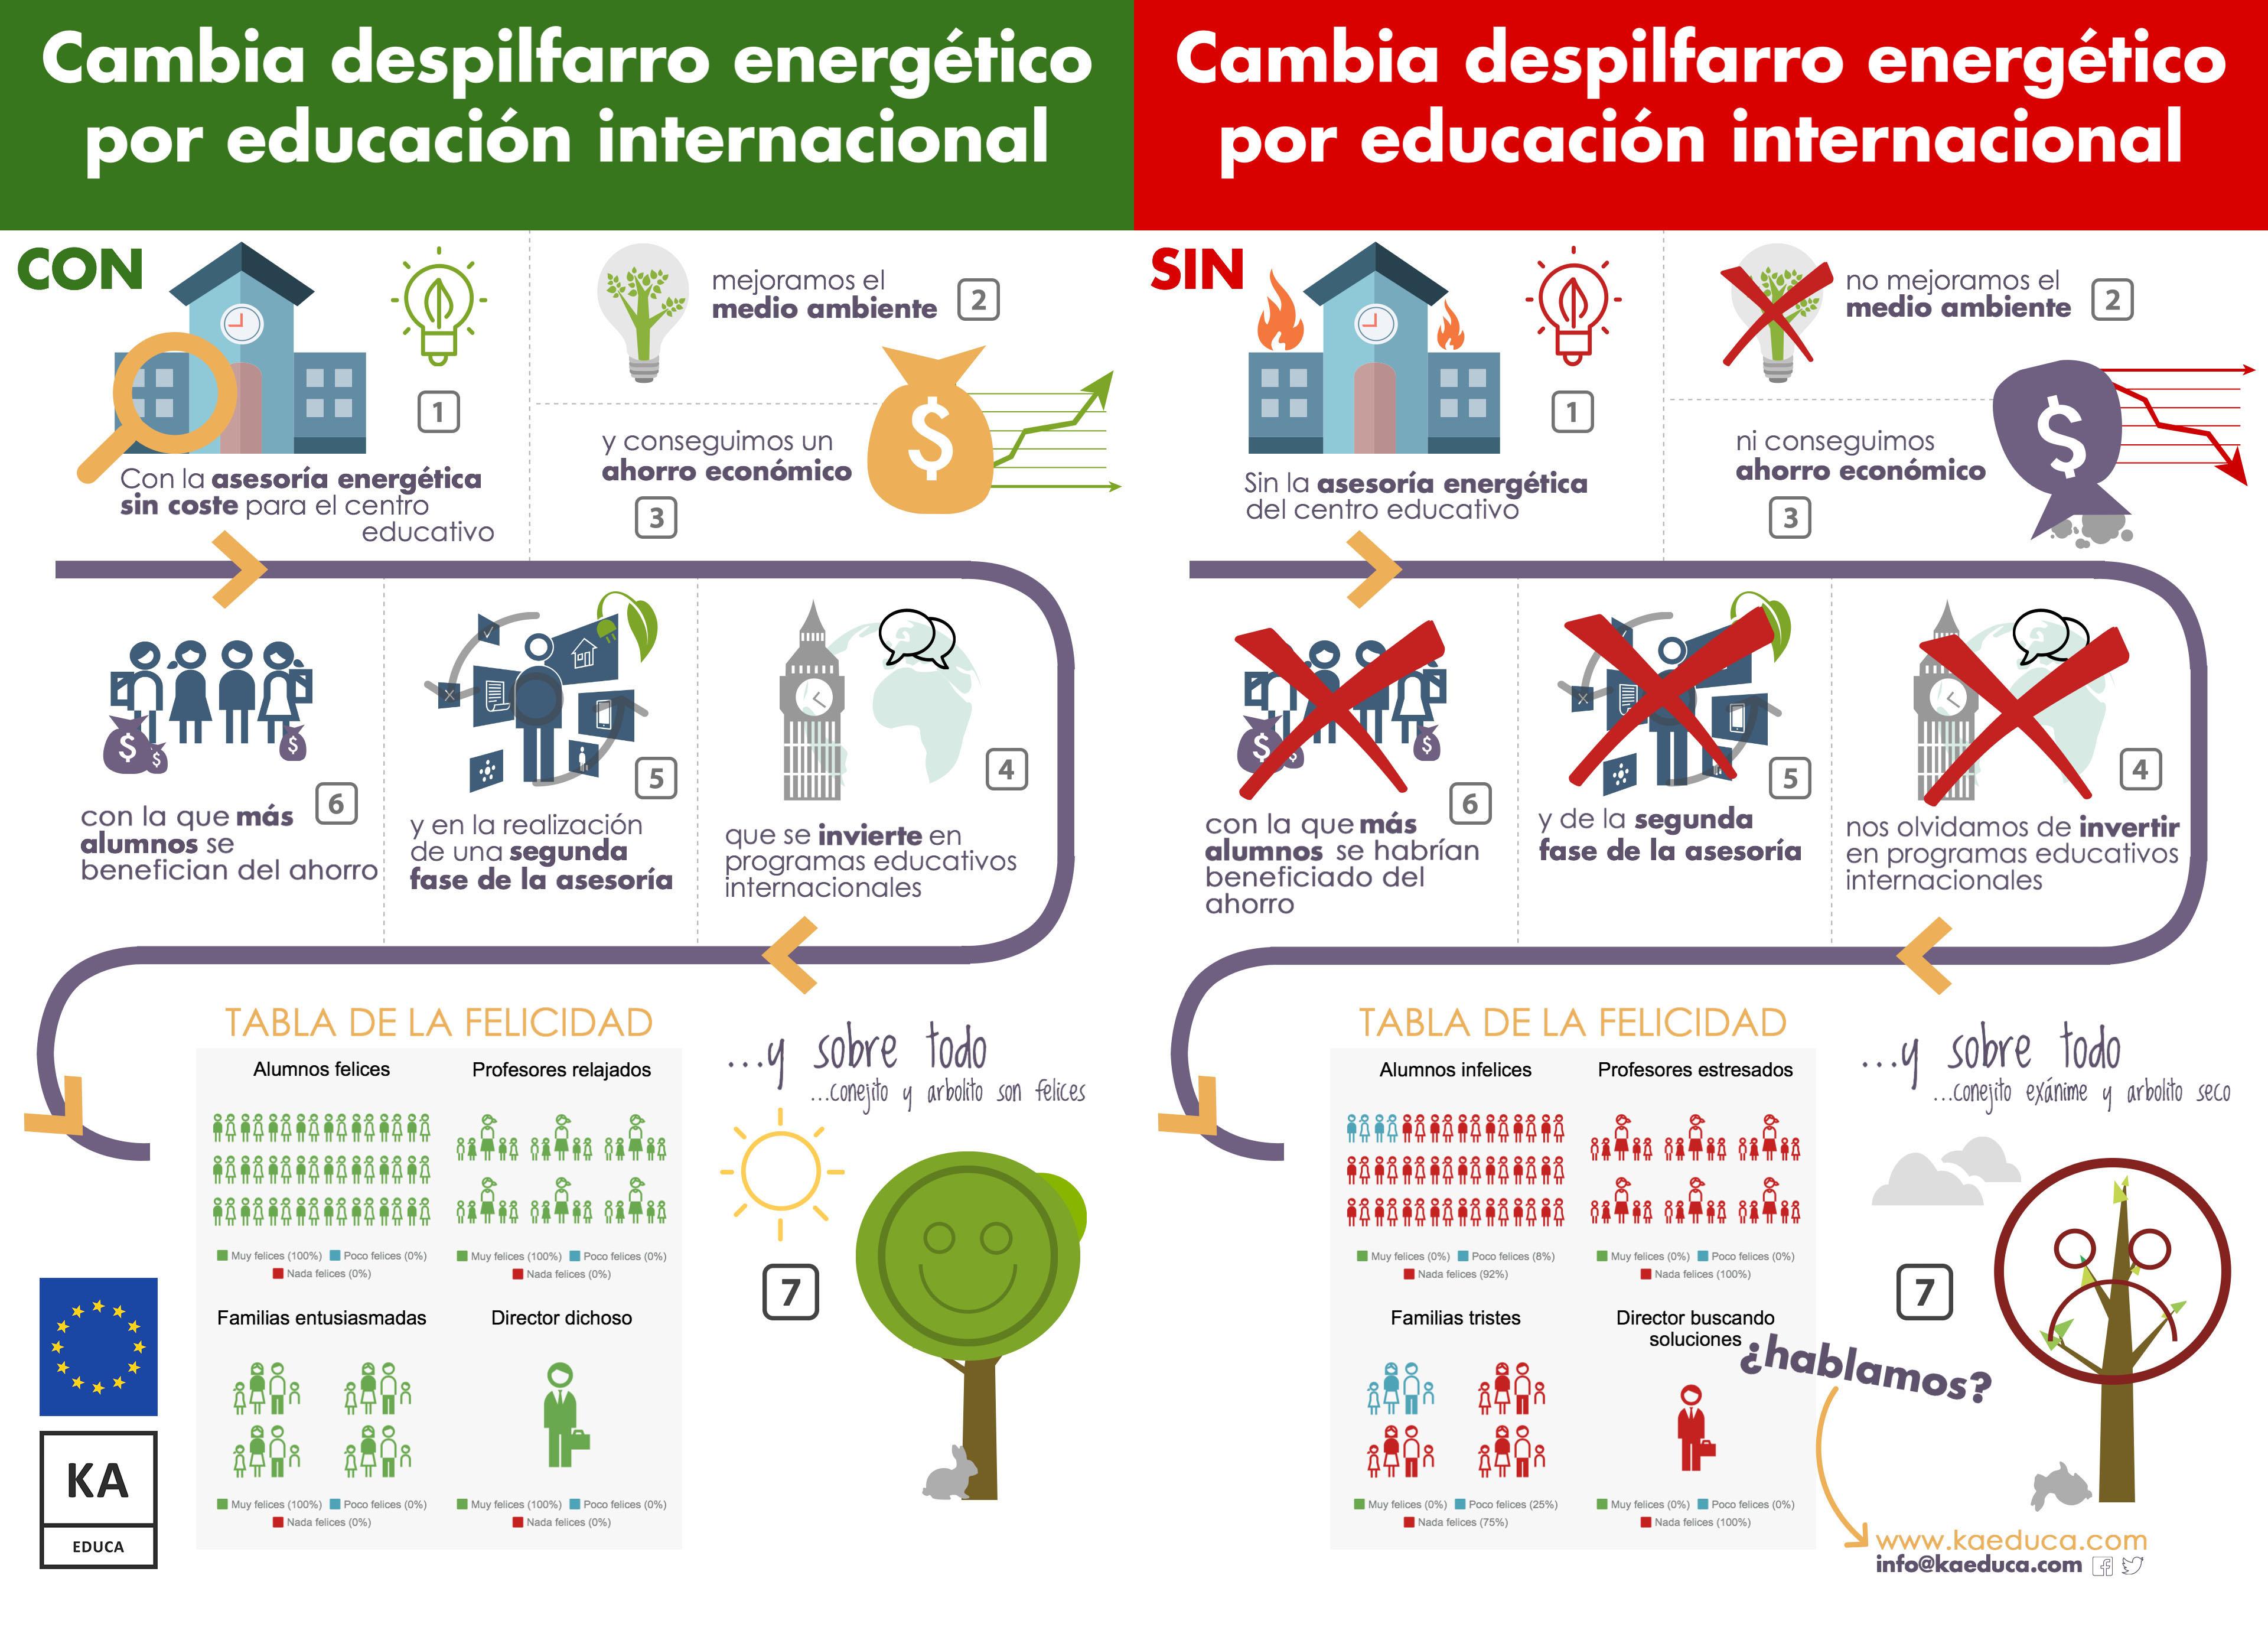 Cambia despilfarro energético por educación internacional